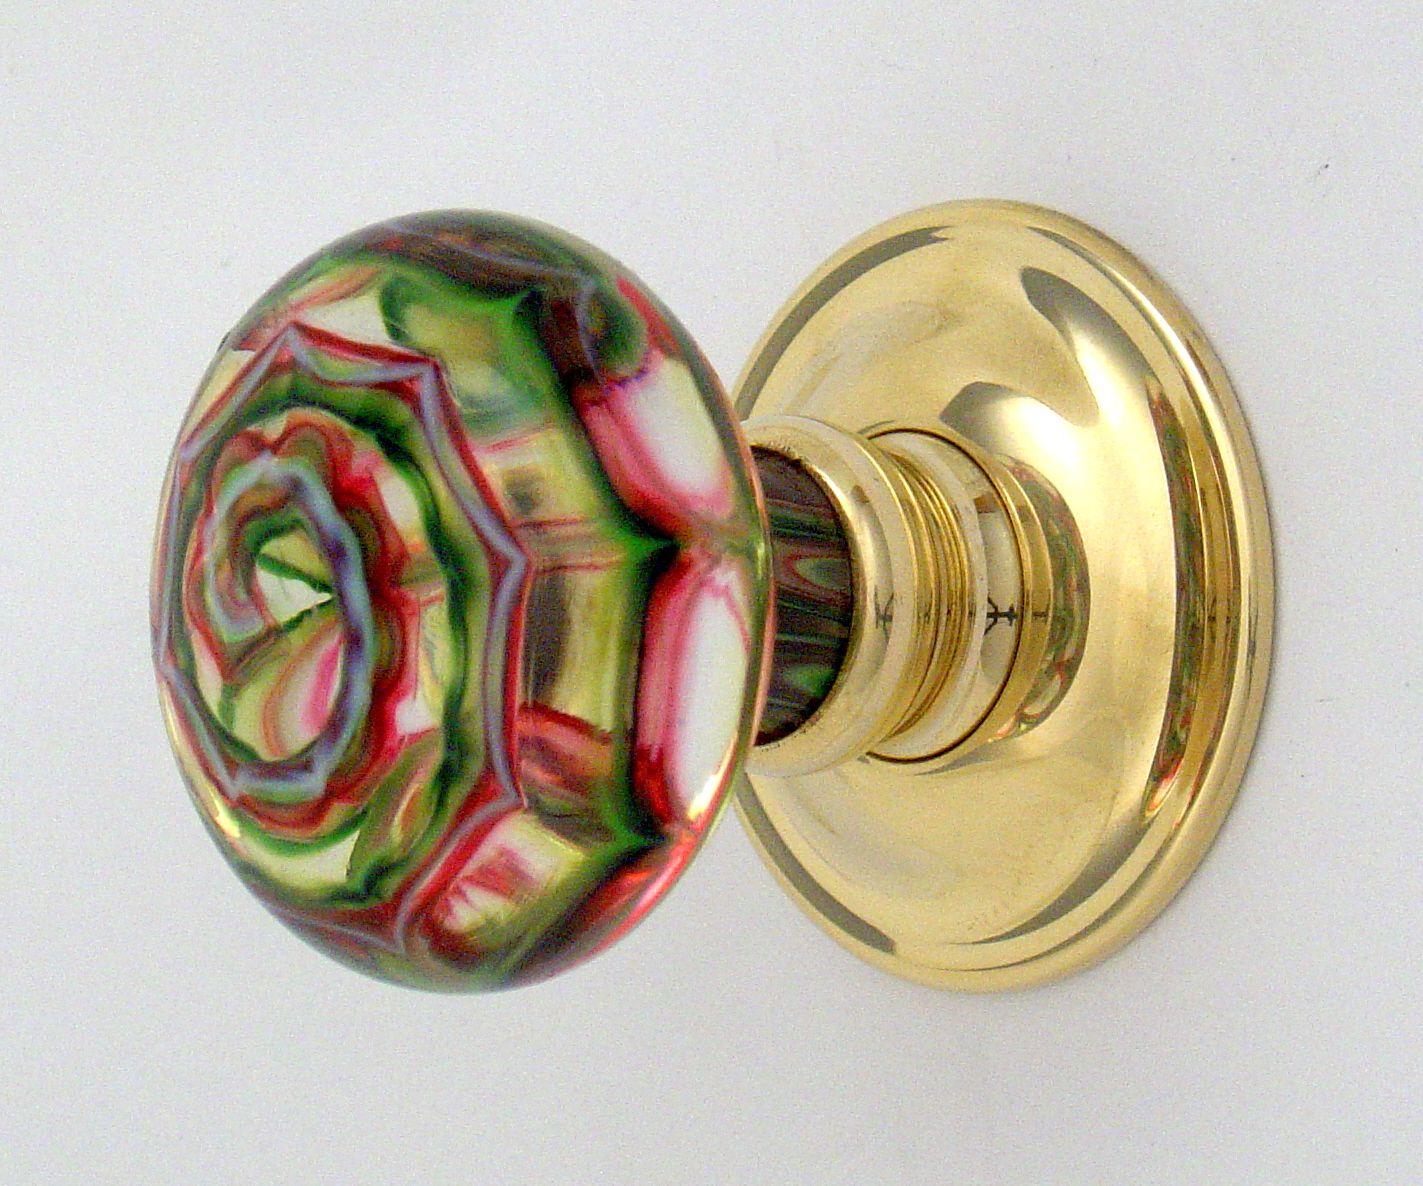 Artisan glass door knobs by Merlin Glass   Doors   Pinterest   Glass ...